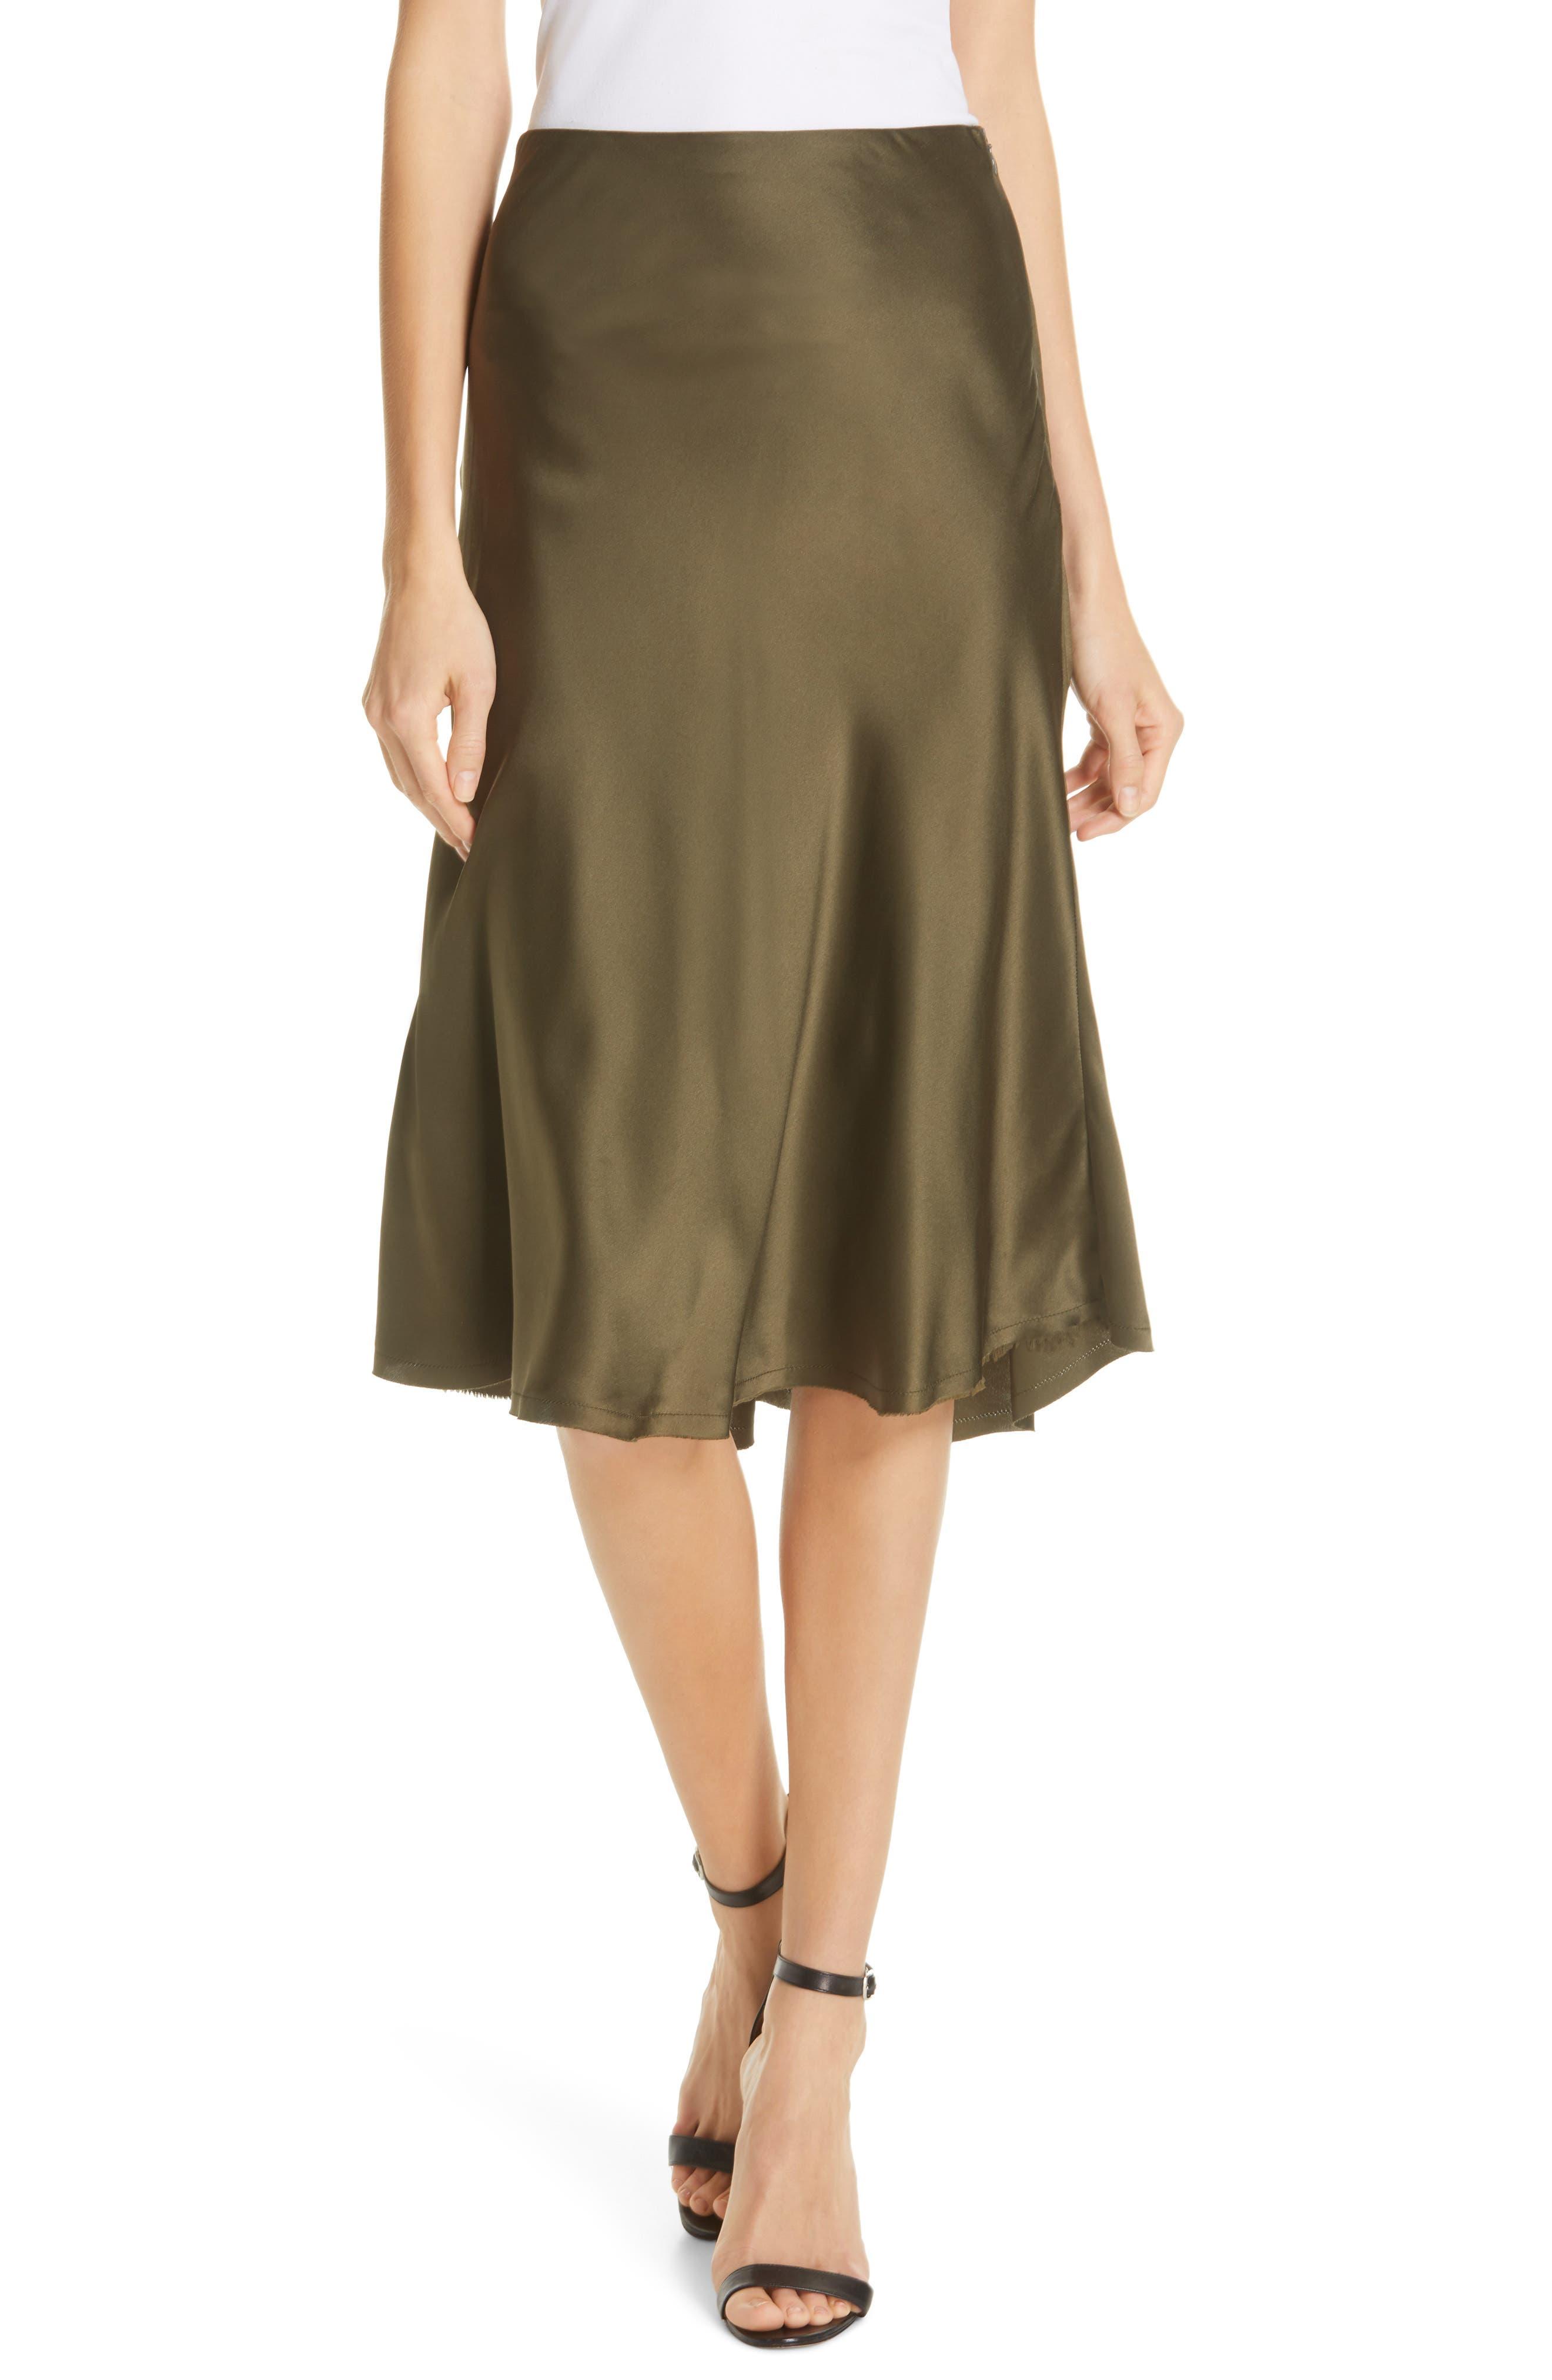 NILI LOTAN Lane Silk Skirt, Main, color, ARMY GREEN